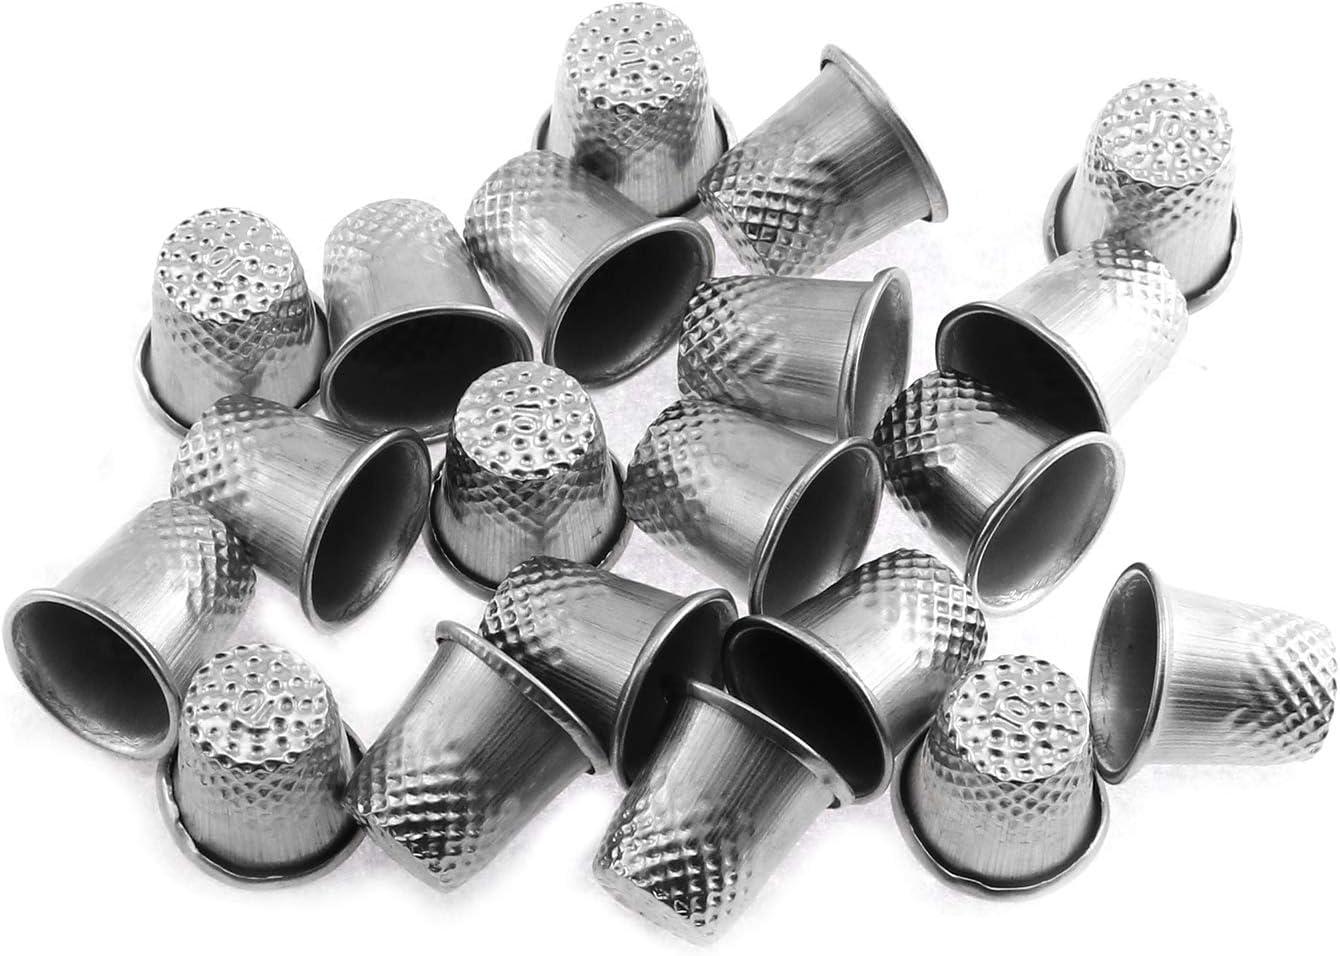 Maxmoral 20pcs Sewing Thimbles Quilting Thimbles Finger Protecto